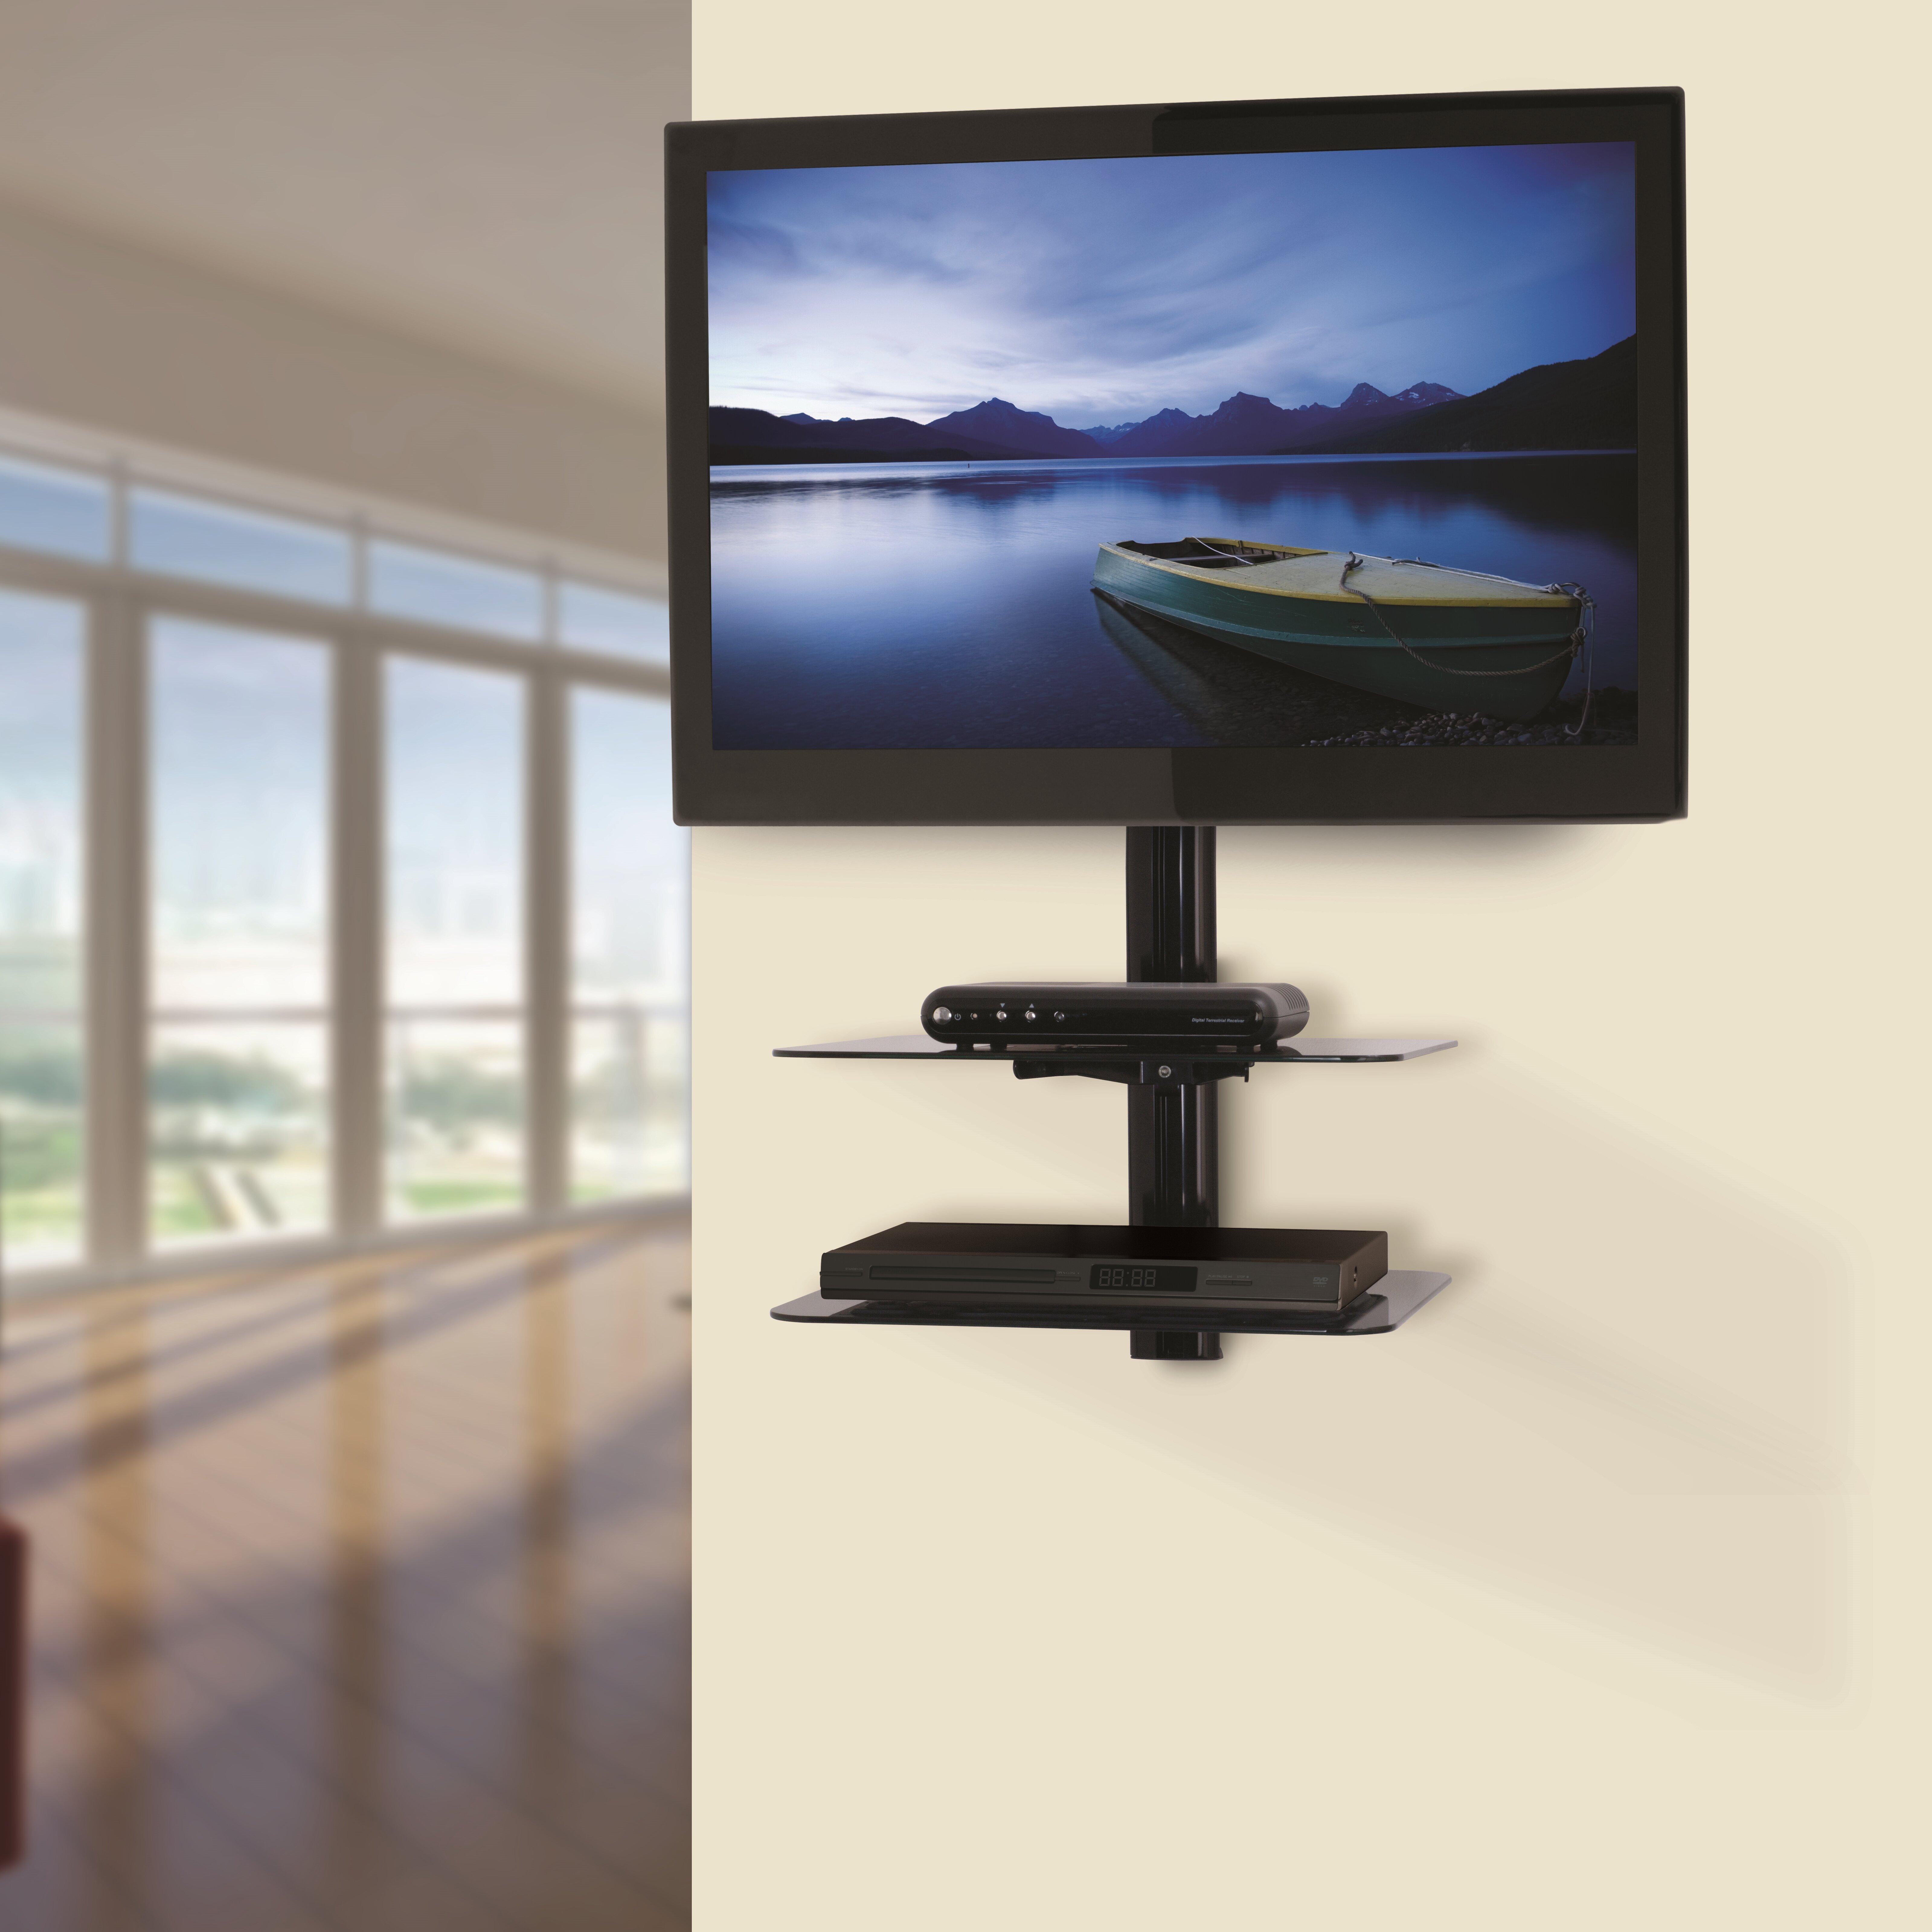 Avf Tilt And Turn Tv Wall Mount For 47 Flat Panel Screens